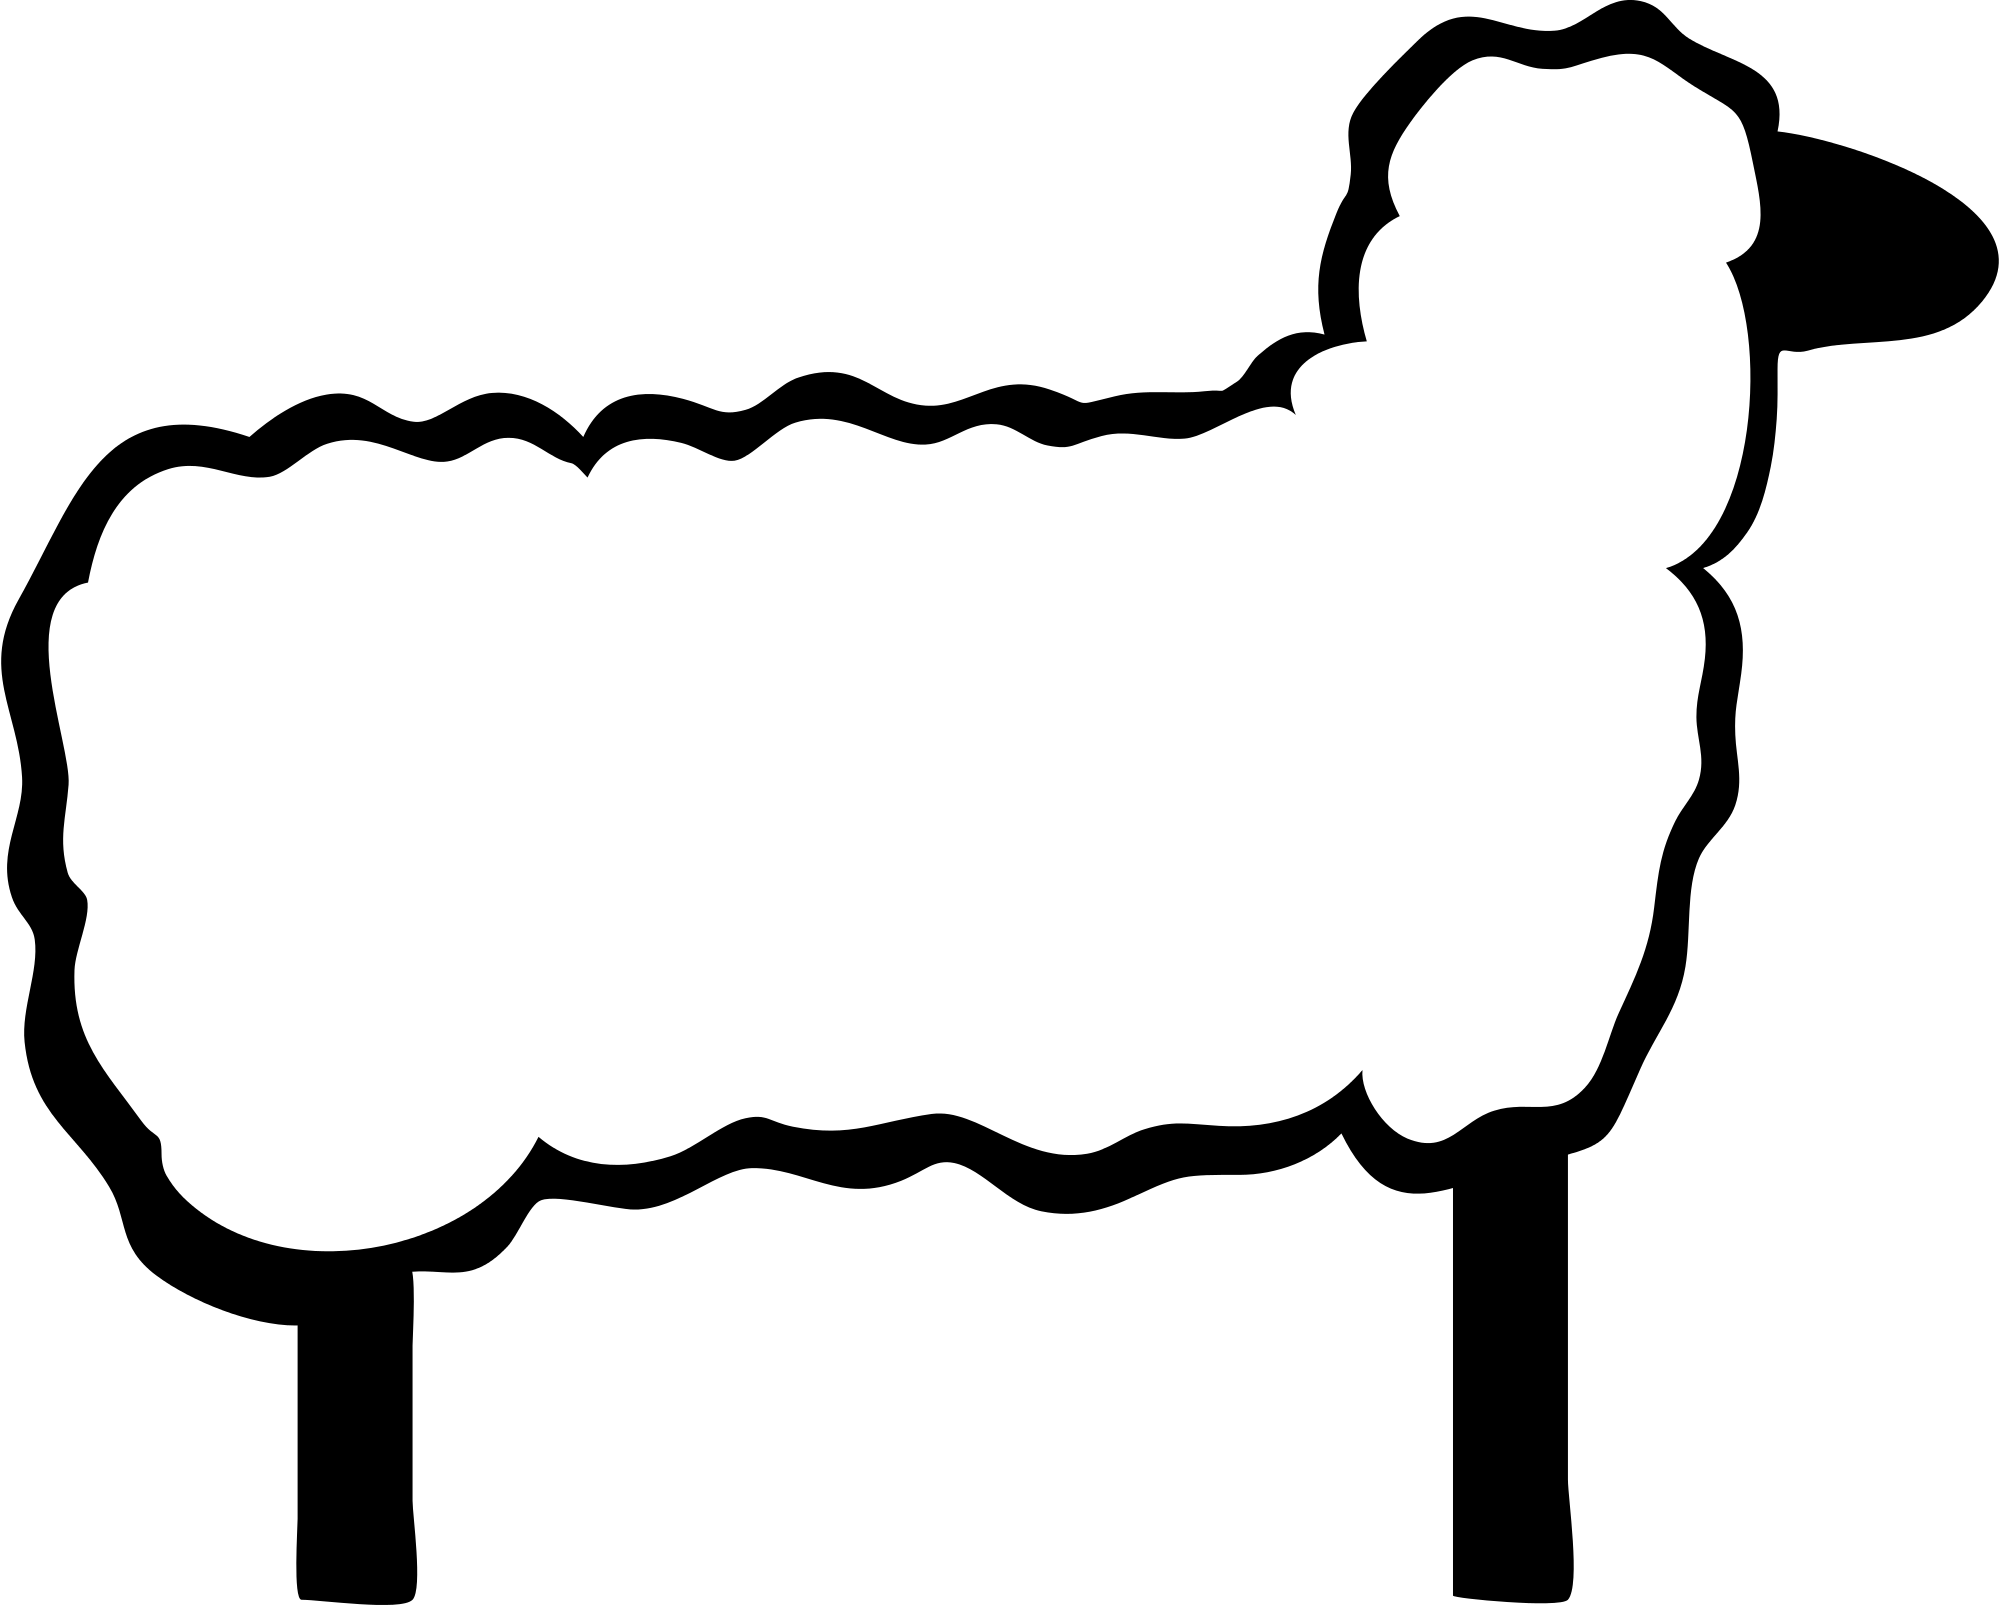 Lamb clipart svg. File sheep wikimedia commons